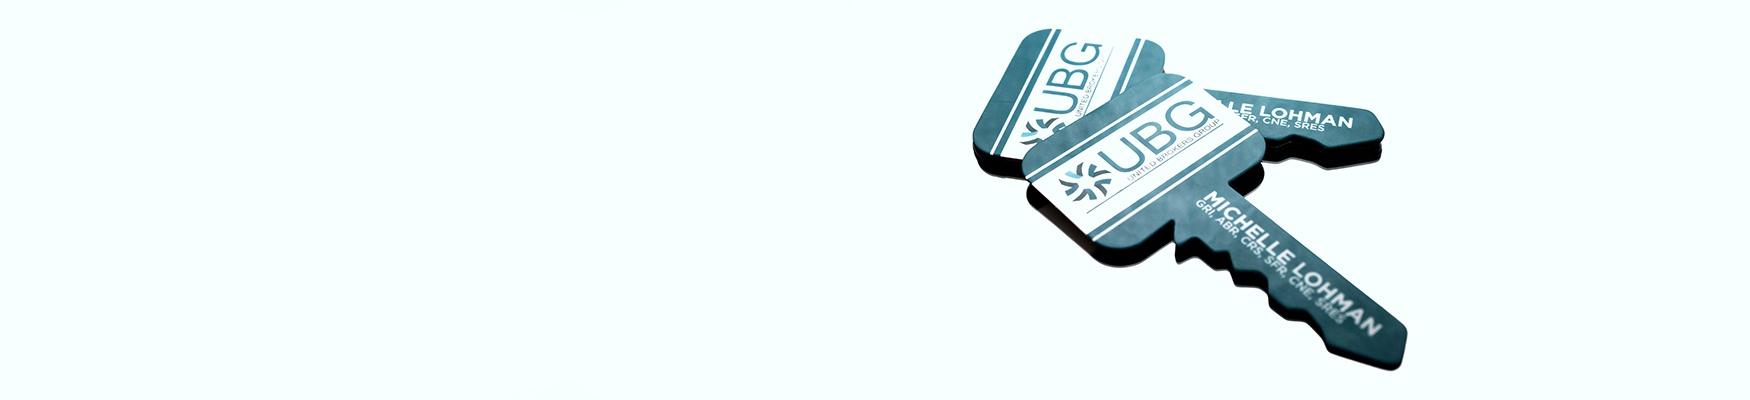 Real estate business cards plastic printers example of custom key shaped real estate business card colourmoves